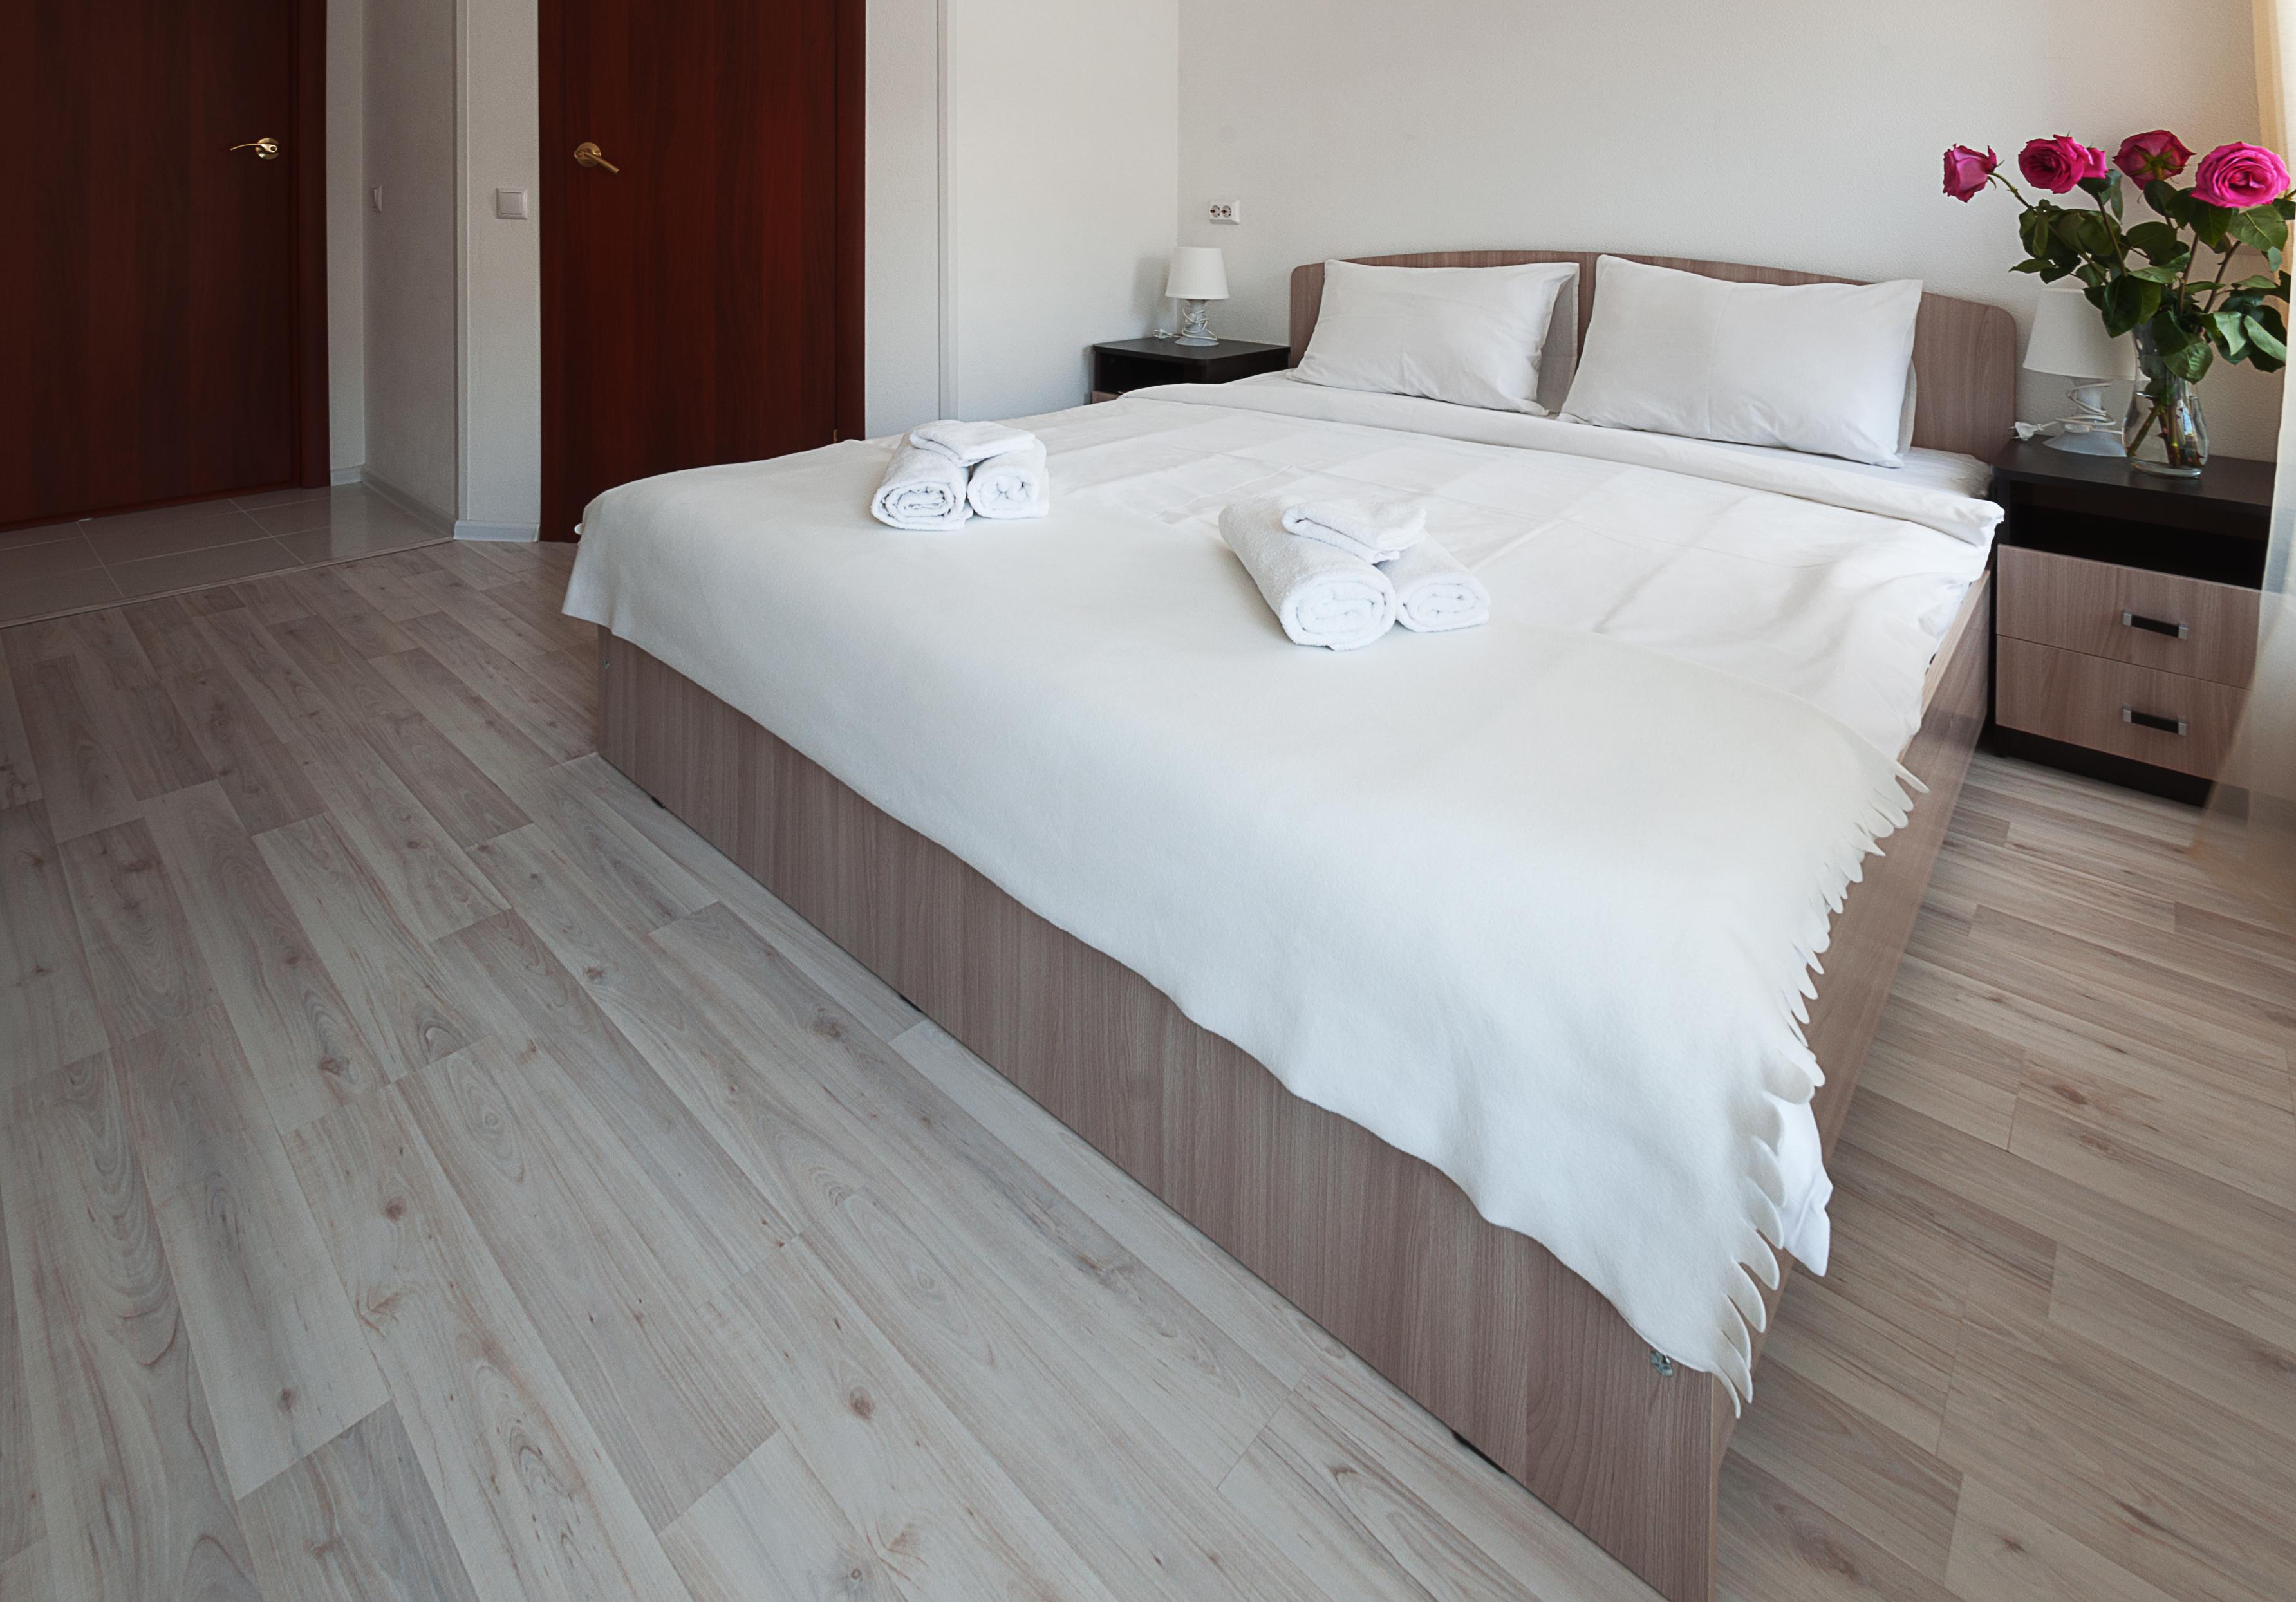 http://megapolis-hotel.ru/wp-content/uploads/2016/08/DSC_5471.jpg